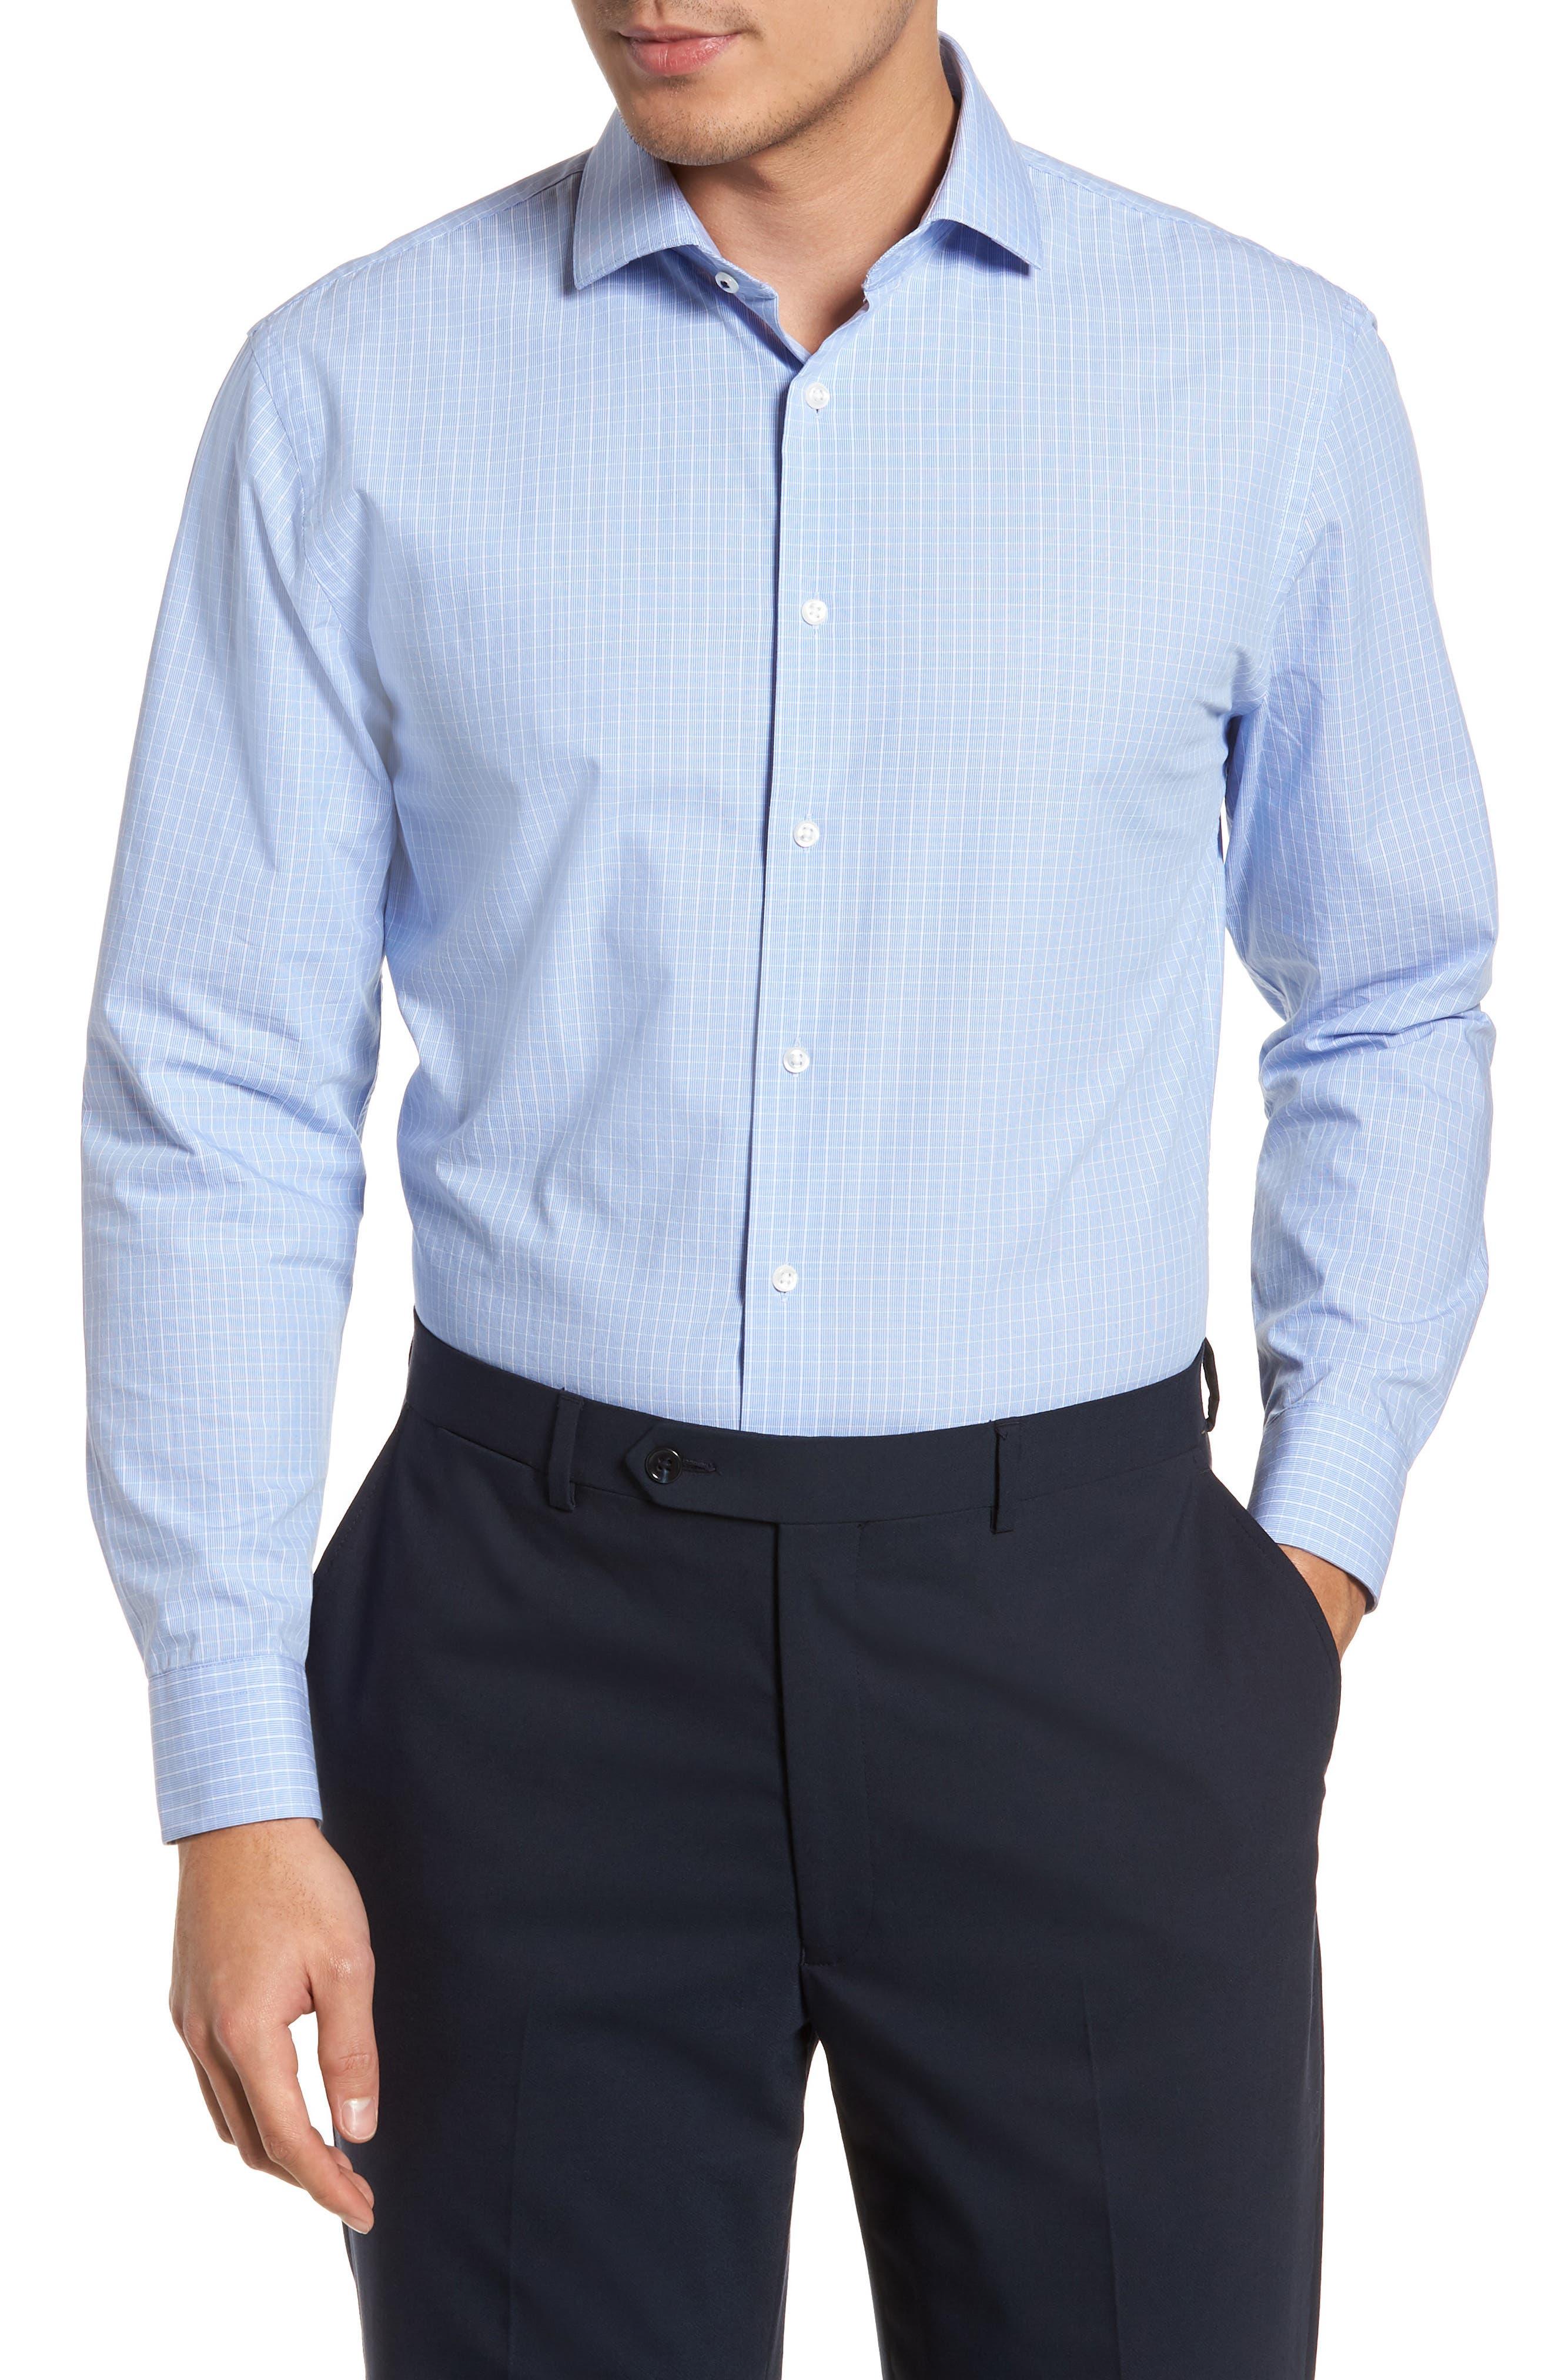 Alternate Image 1 Selected - Nordstrom Men's Shop Tech-Smart Trim Fit Grid Dress Shirt